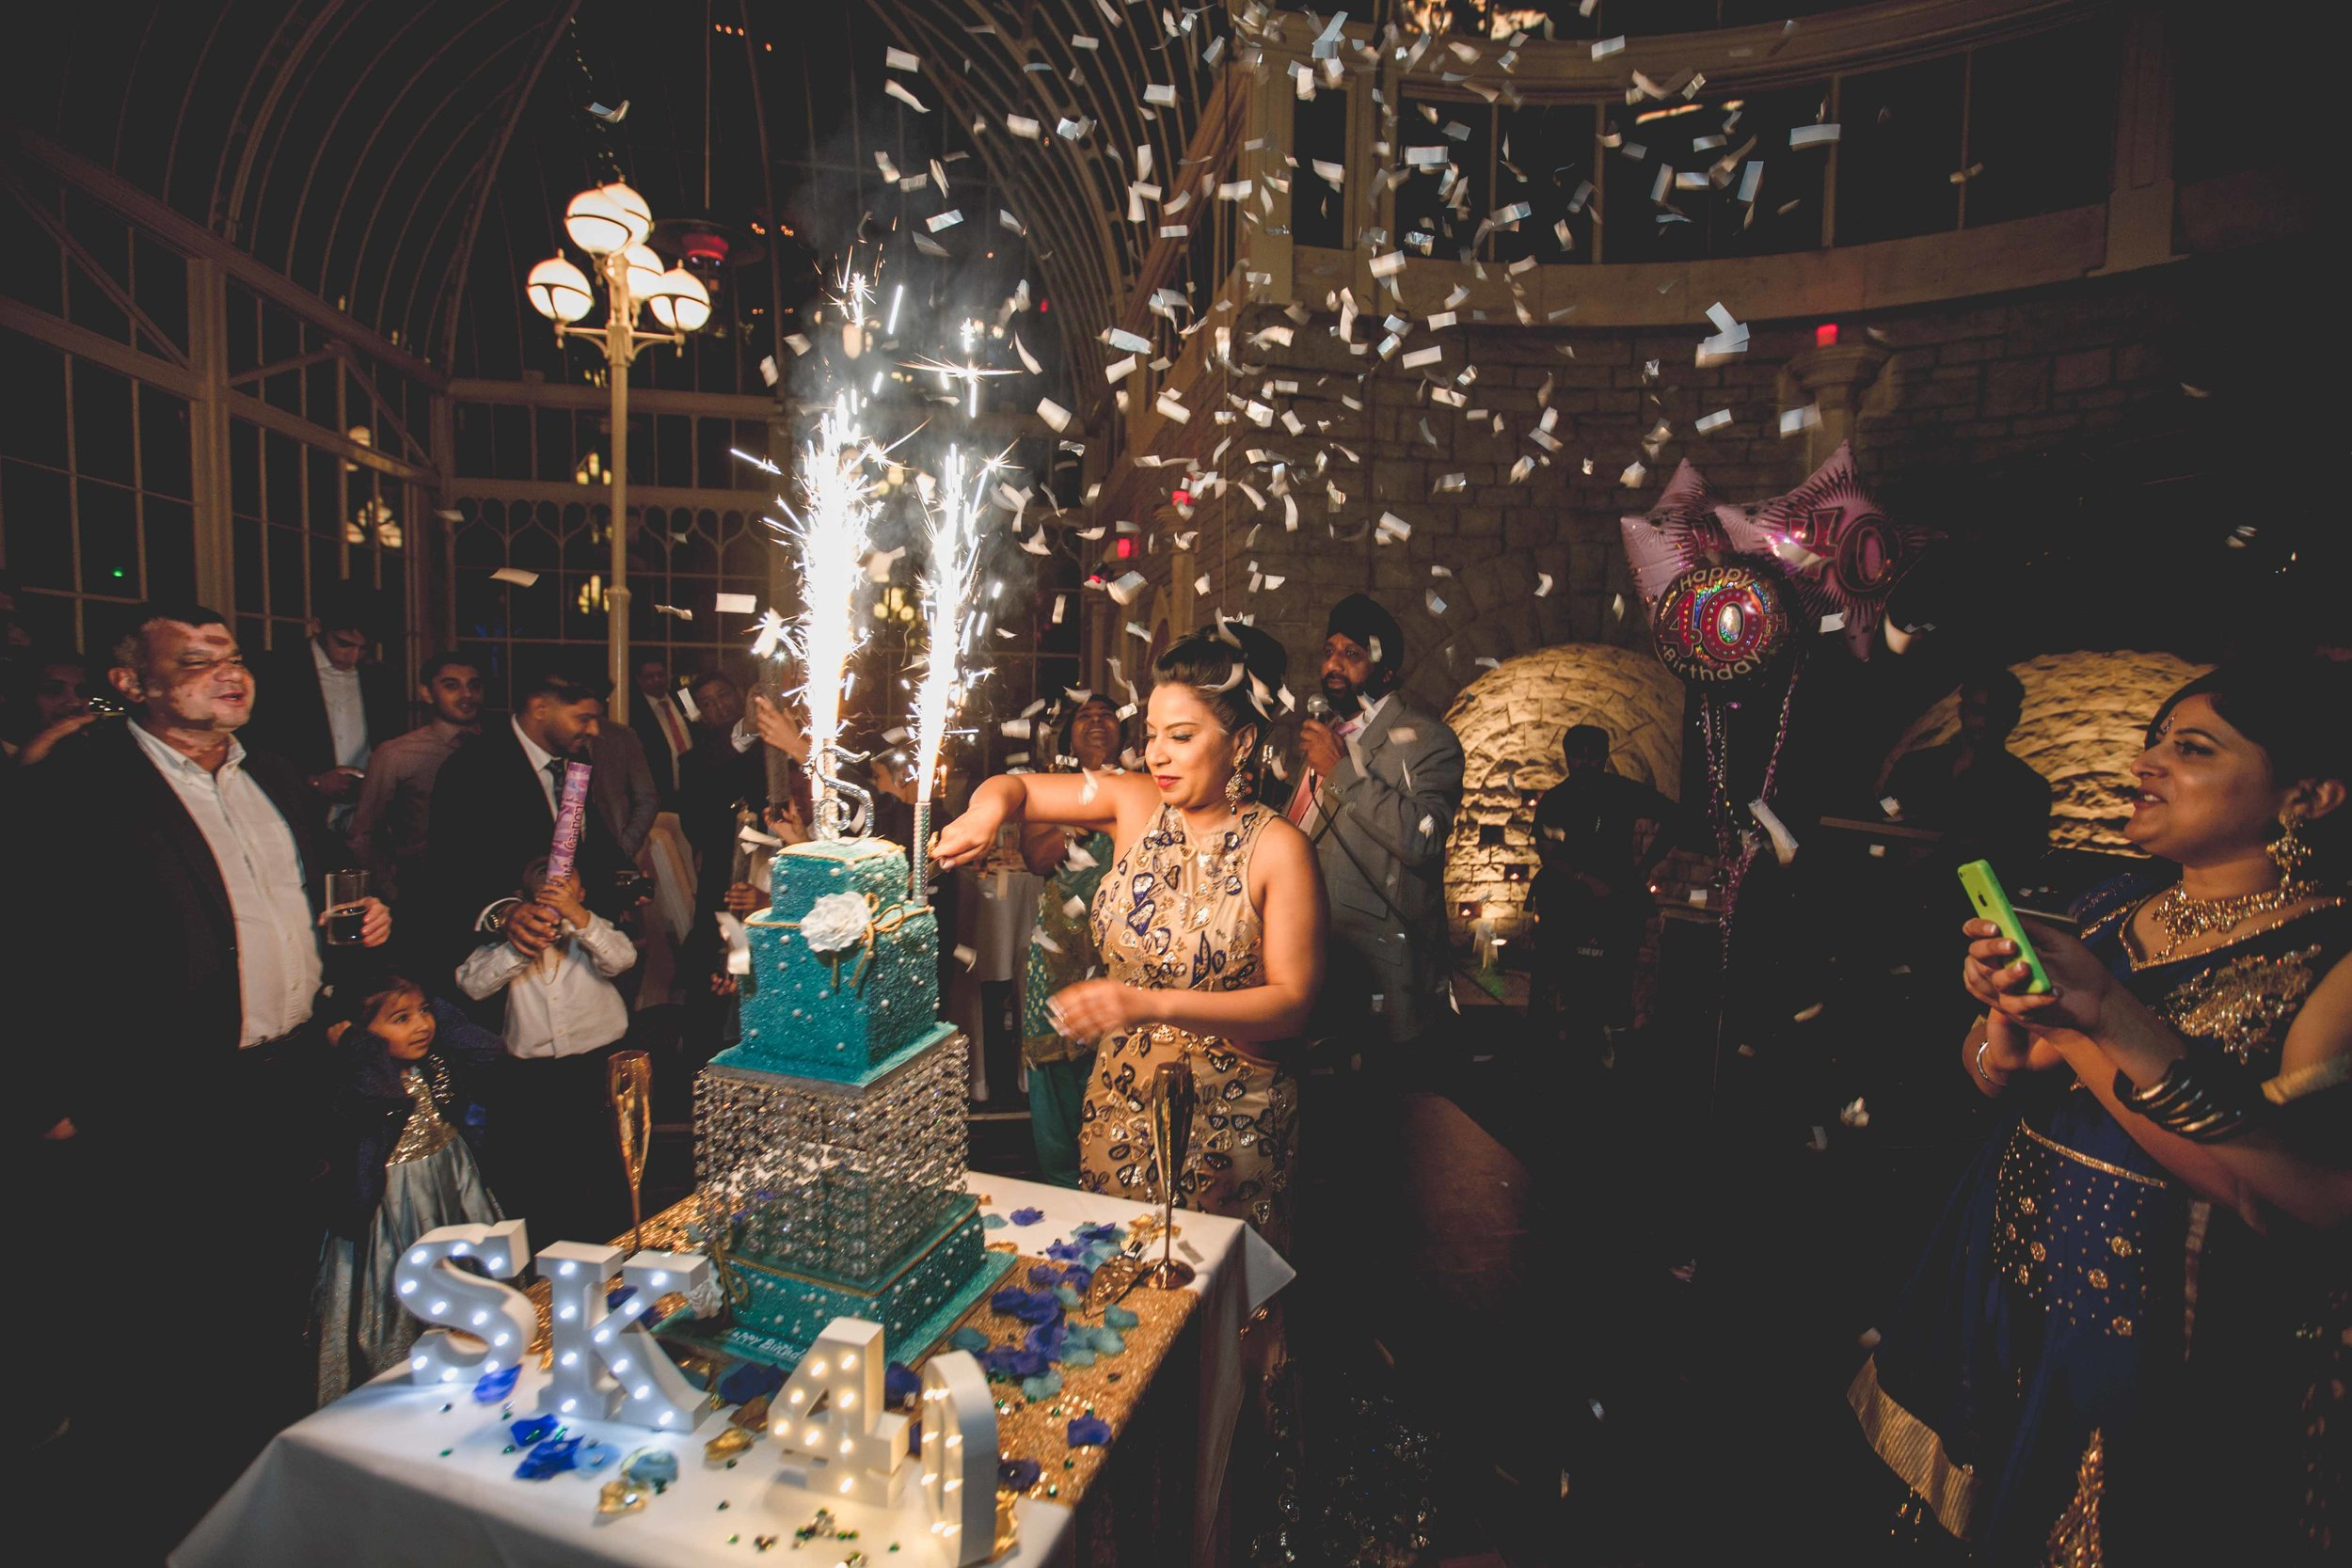 tortworth-Hotel-gloucester-birthday-wedding-photographer-natalia-smith-photography-20.jpg